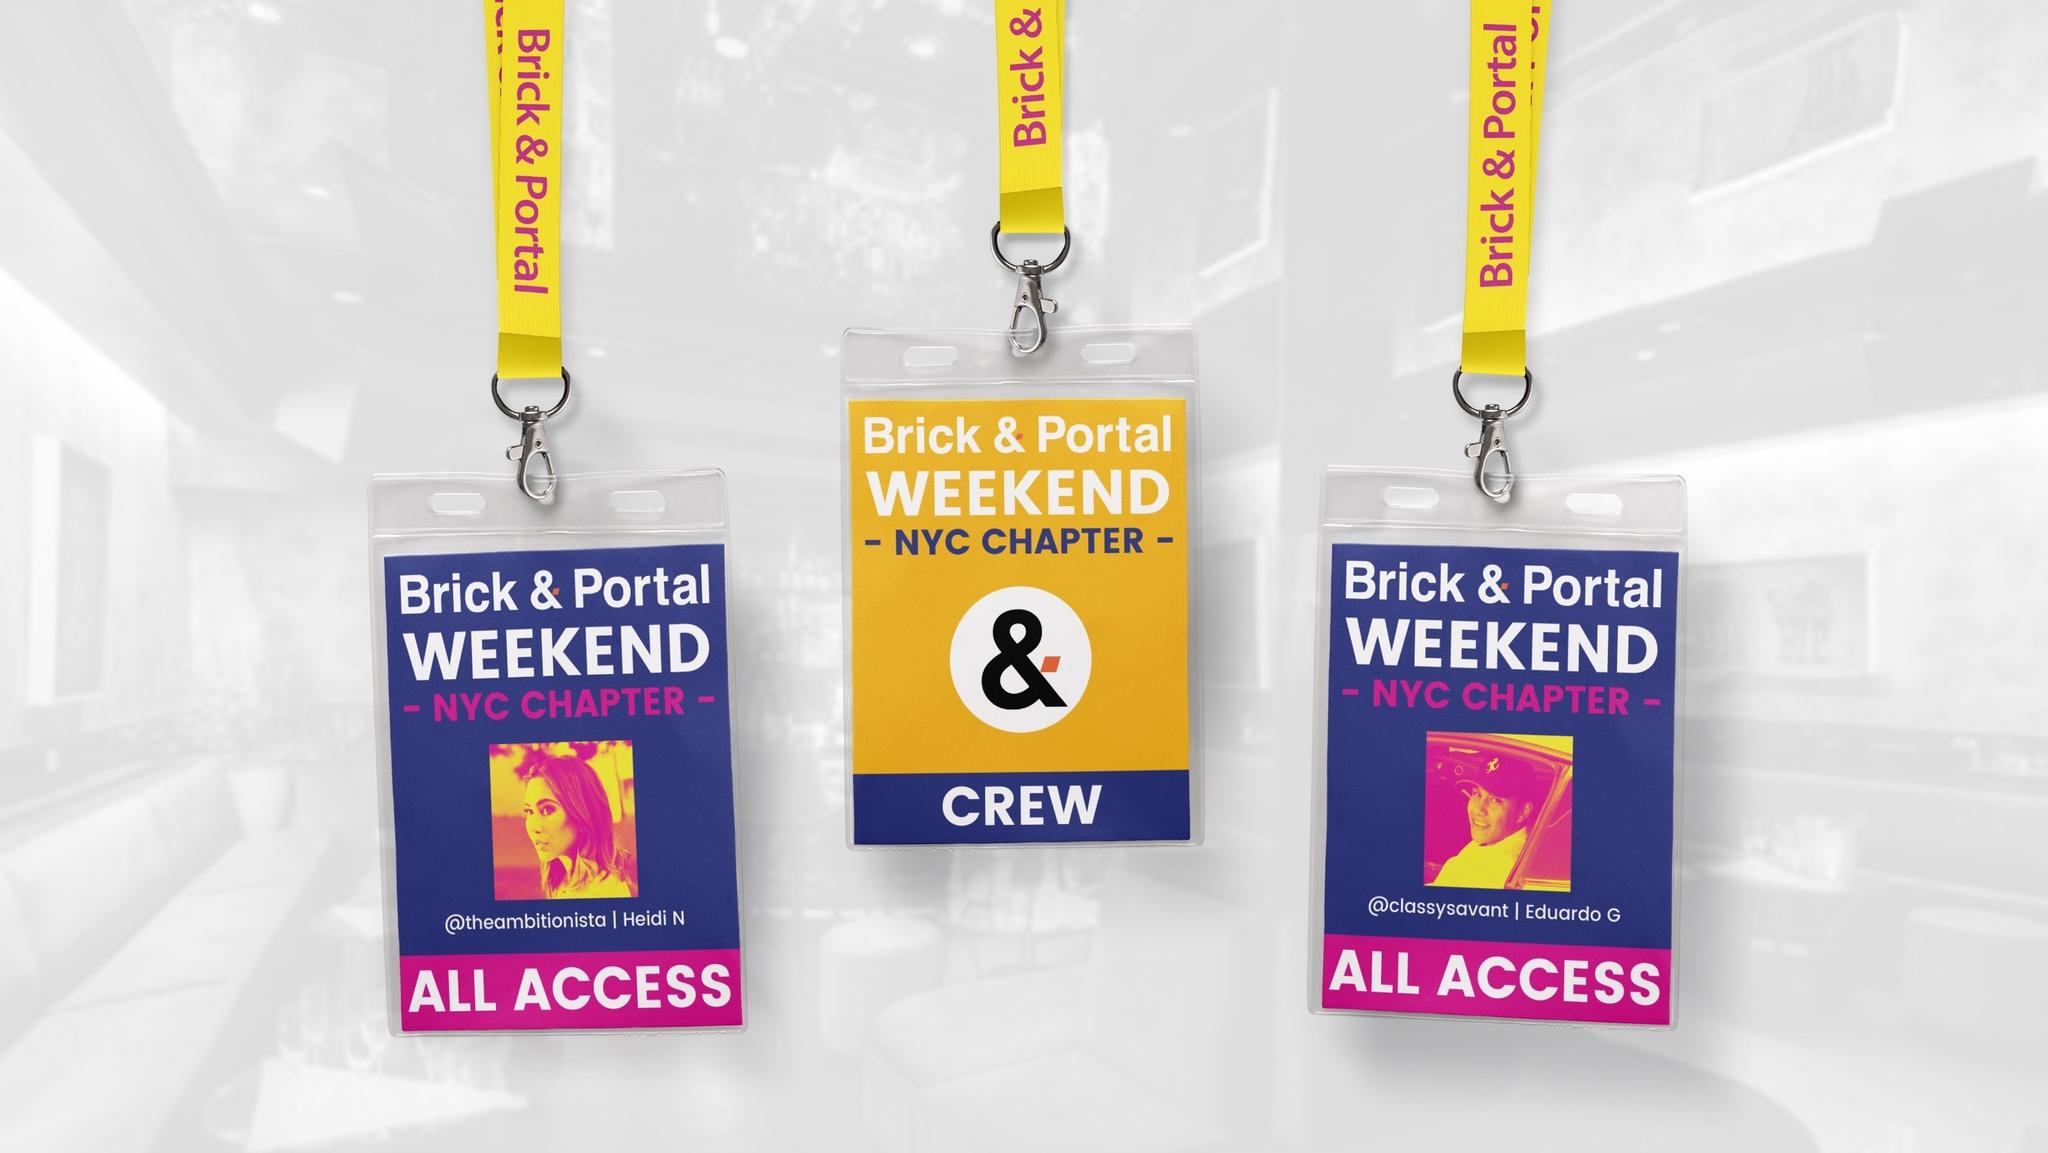 brick & portal weekend - Design